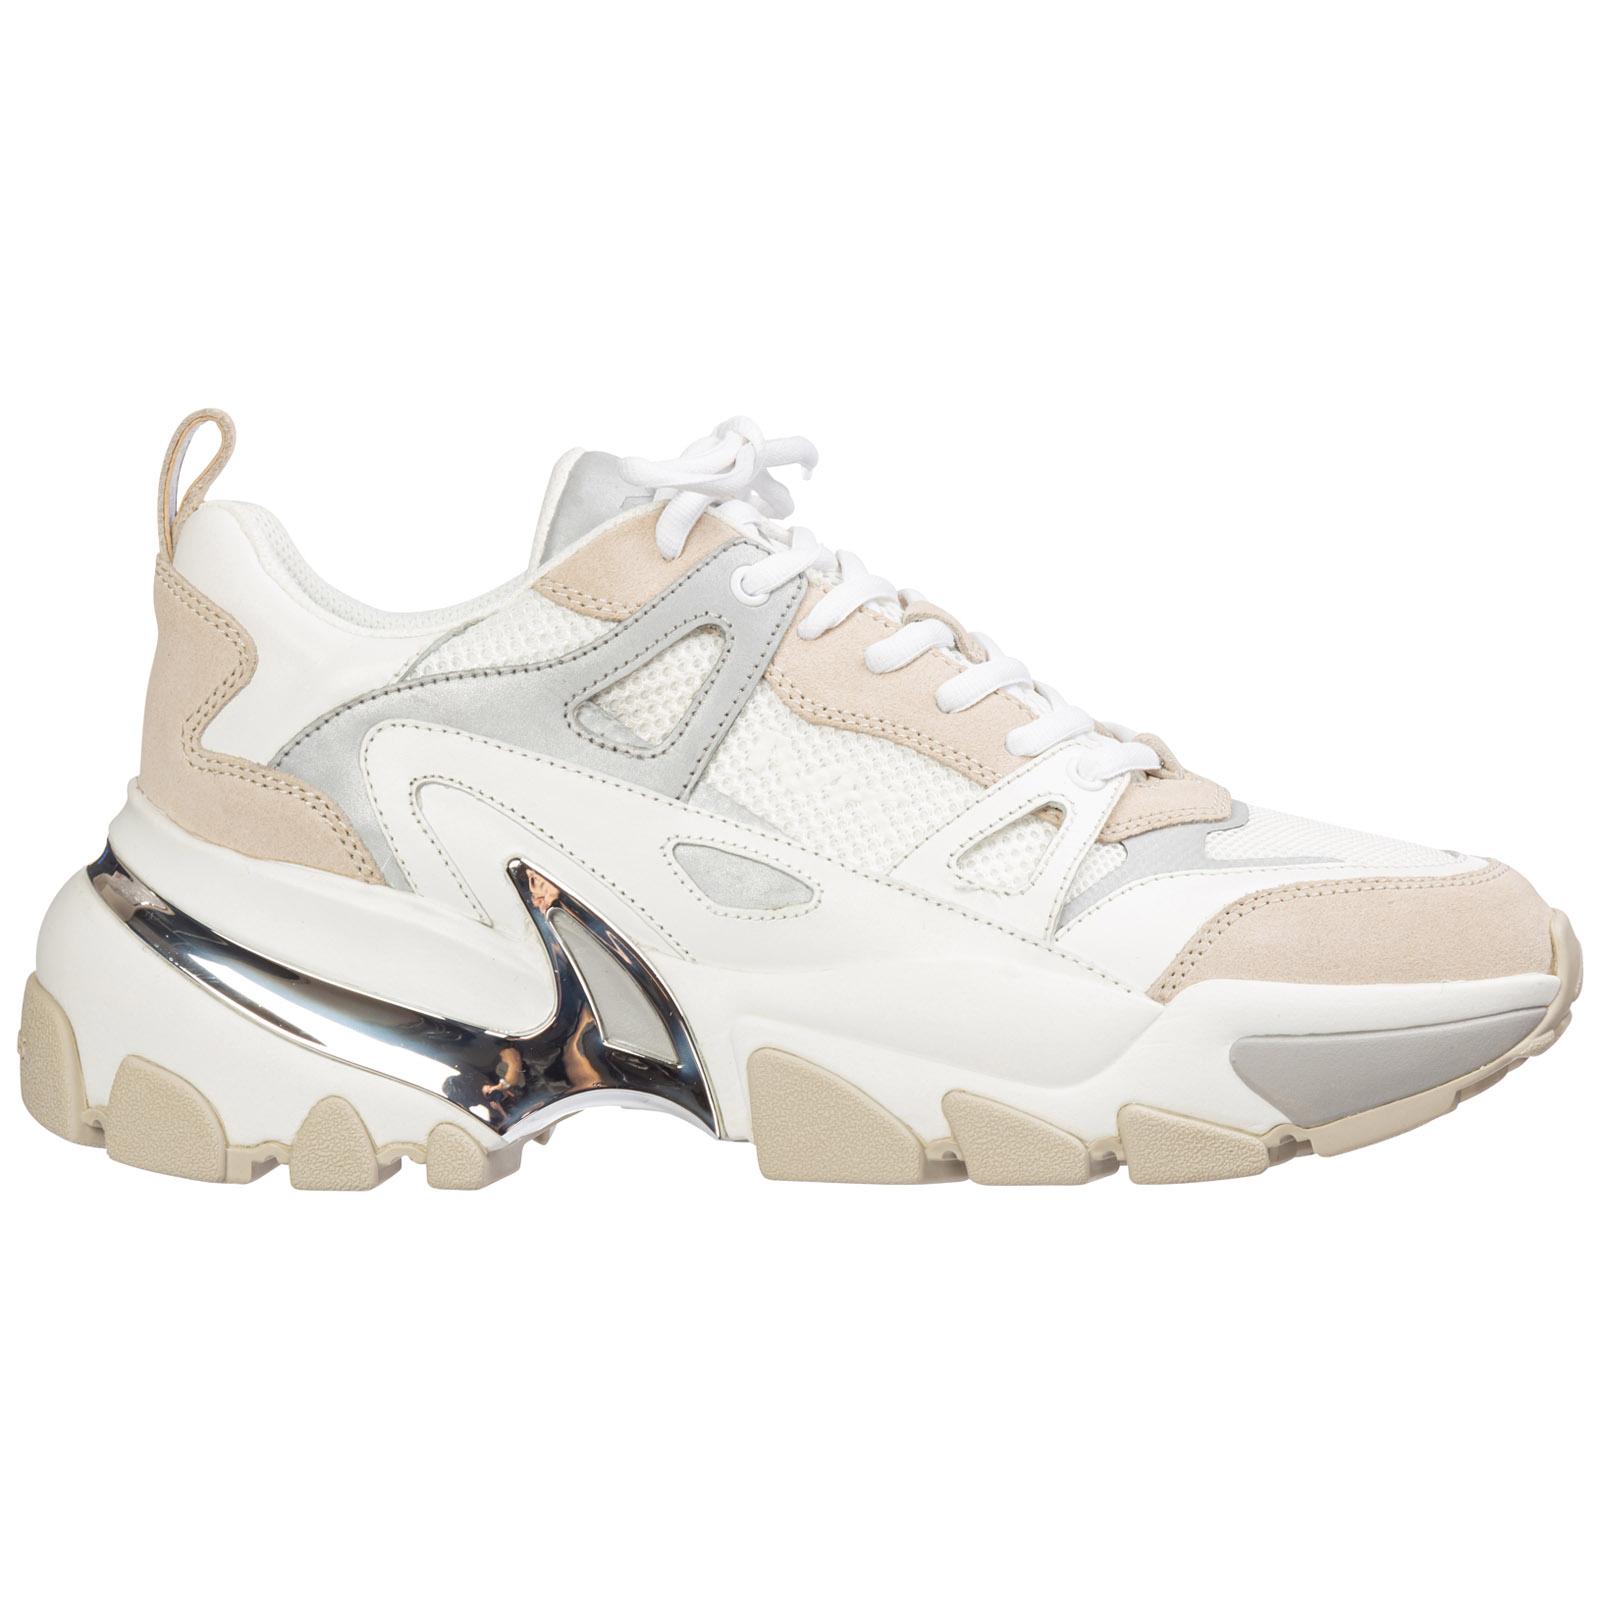 Michael Kors Sneakers MEN'S SHOES SUEDE TRAINERS SNEAKERS PENN